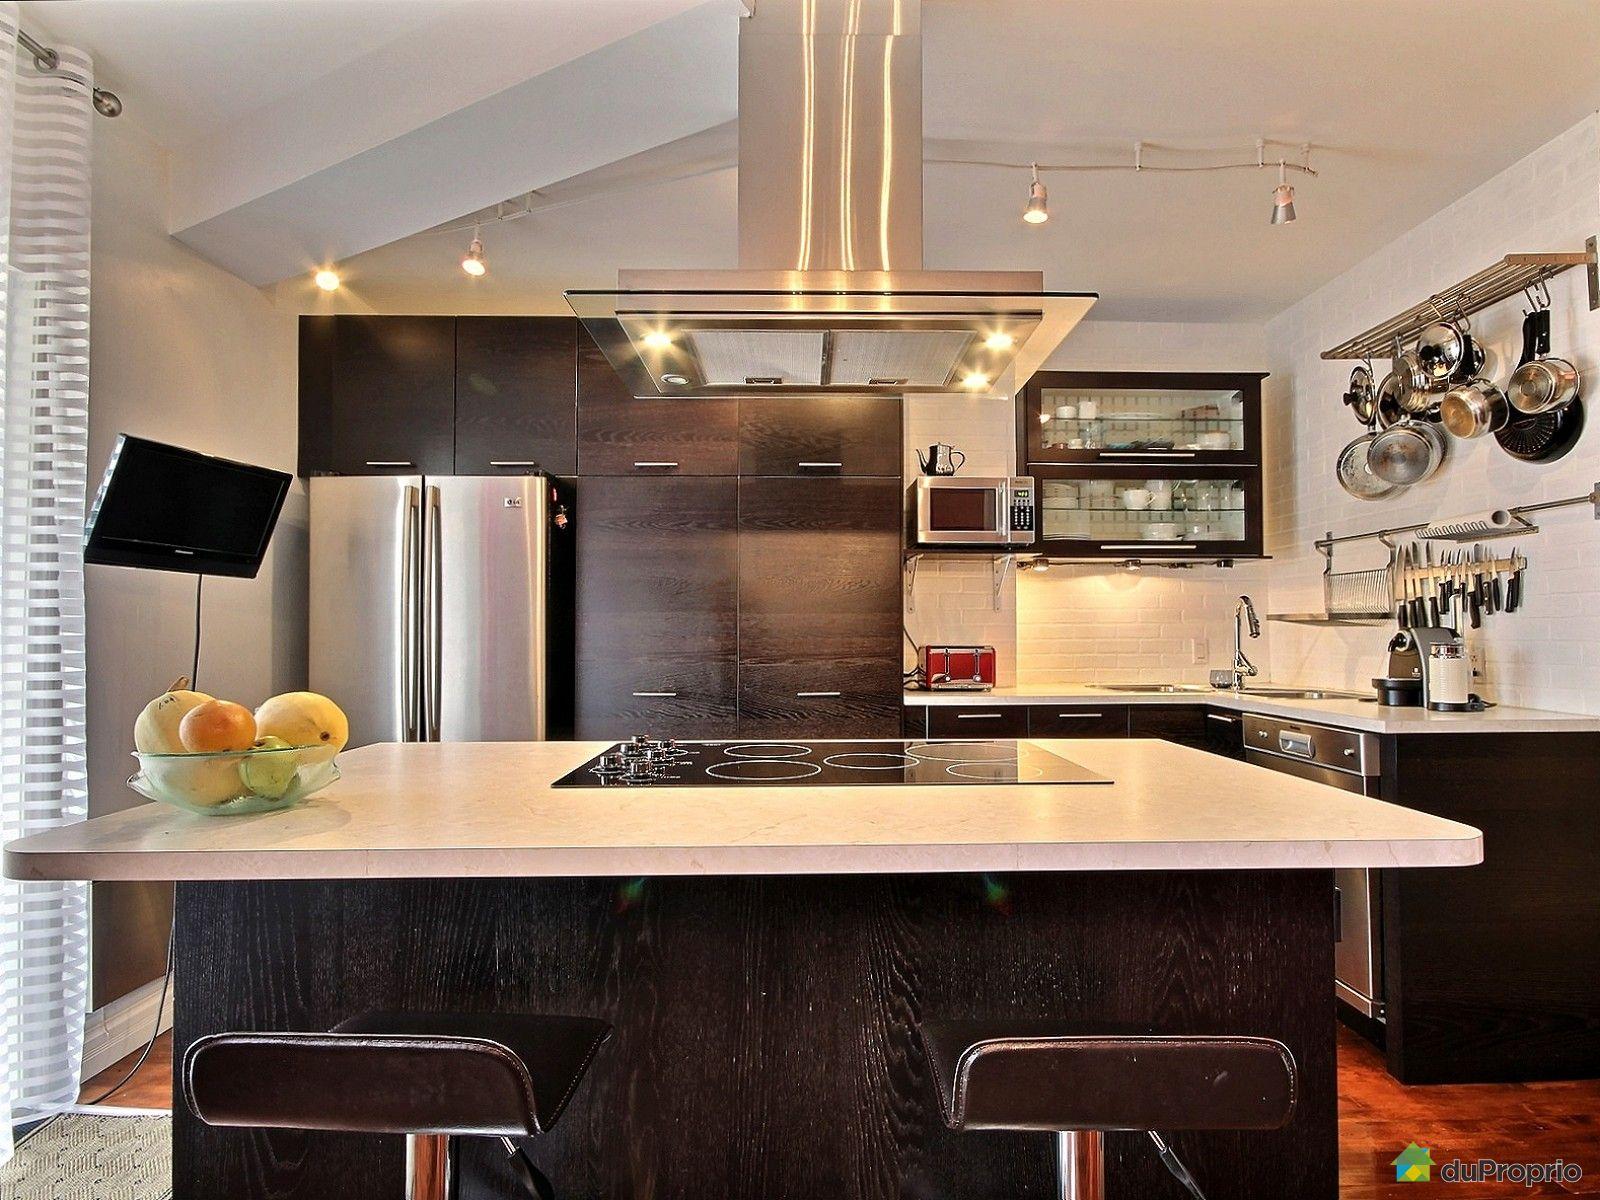 condo vendre montr al 1205 rue allard immobilier qu bec duproprio 560981. Black Bedroom Furniture Sets. Home Design Ideas